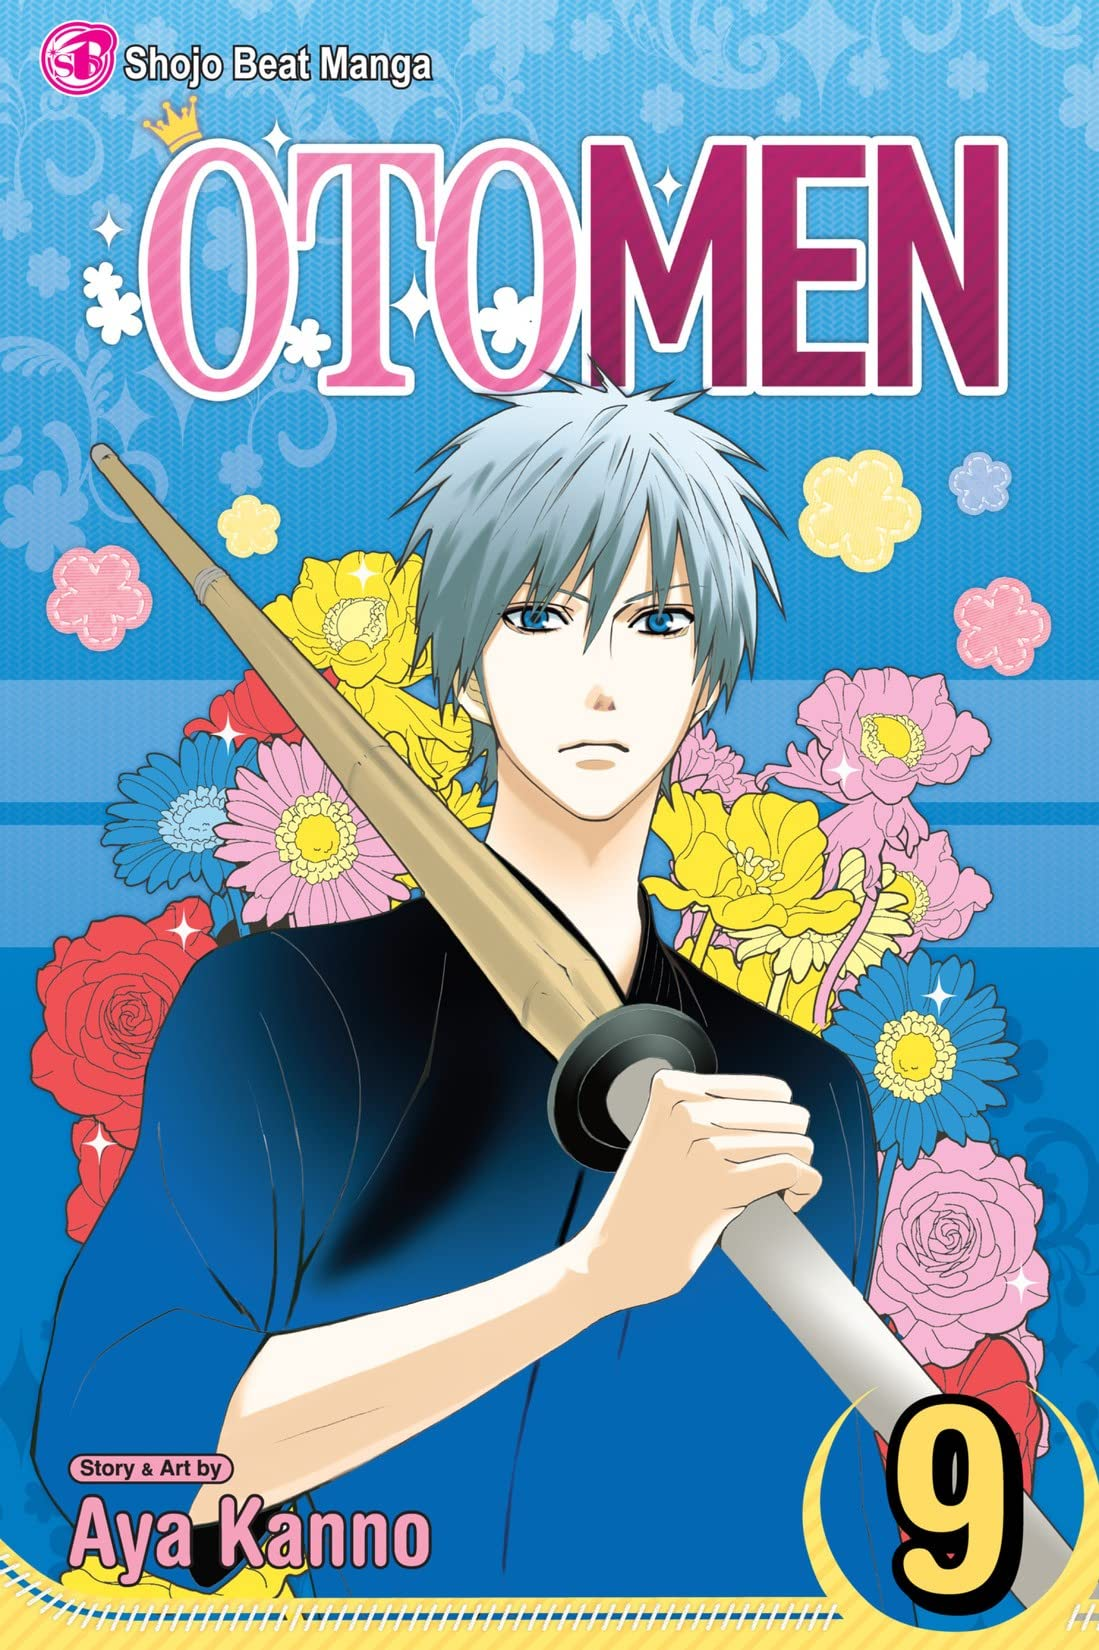 Otomen Vol. 9